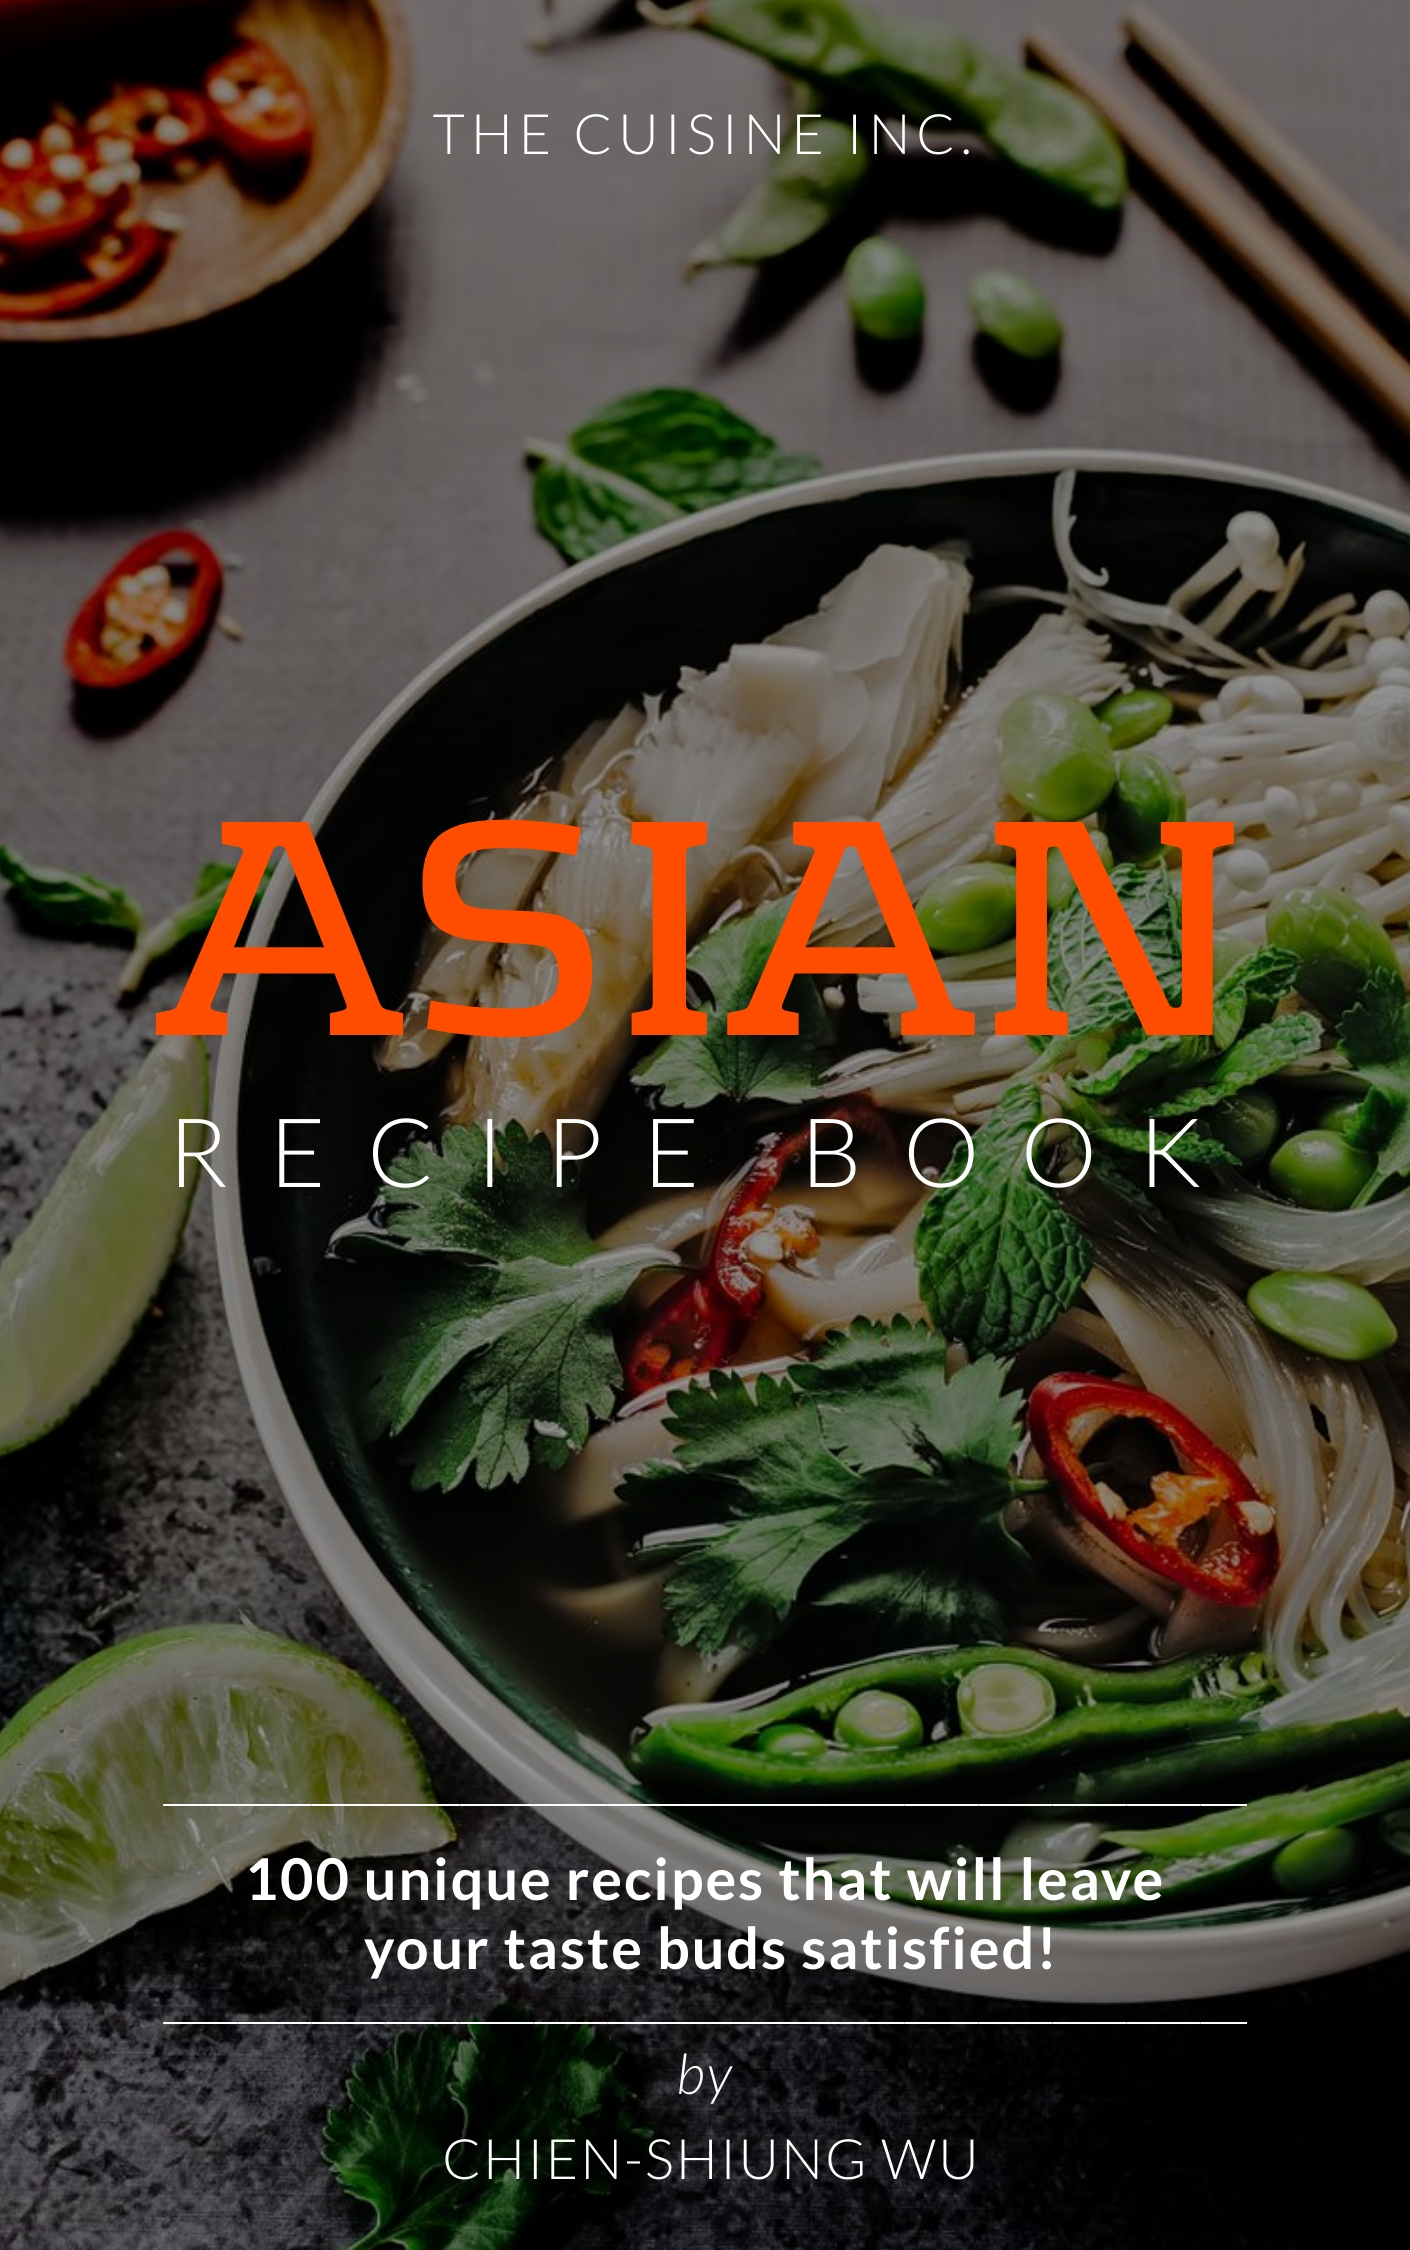 Recipe - Book Cover Template